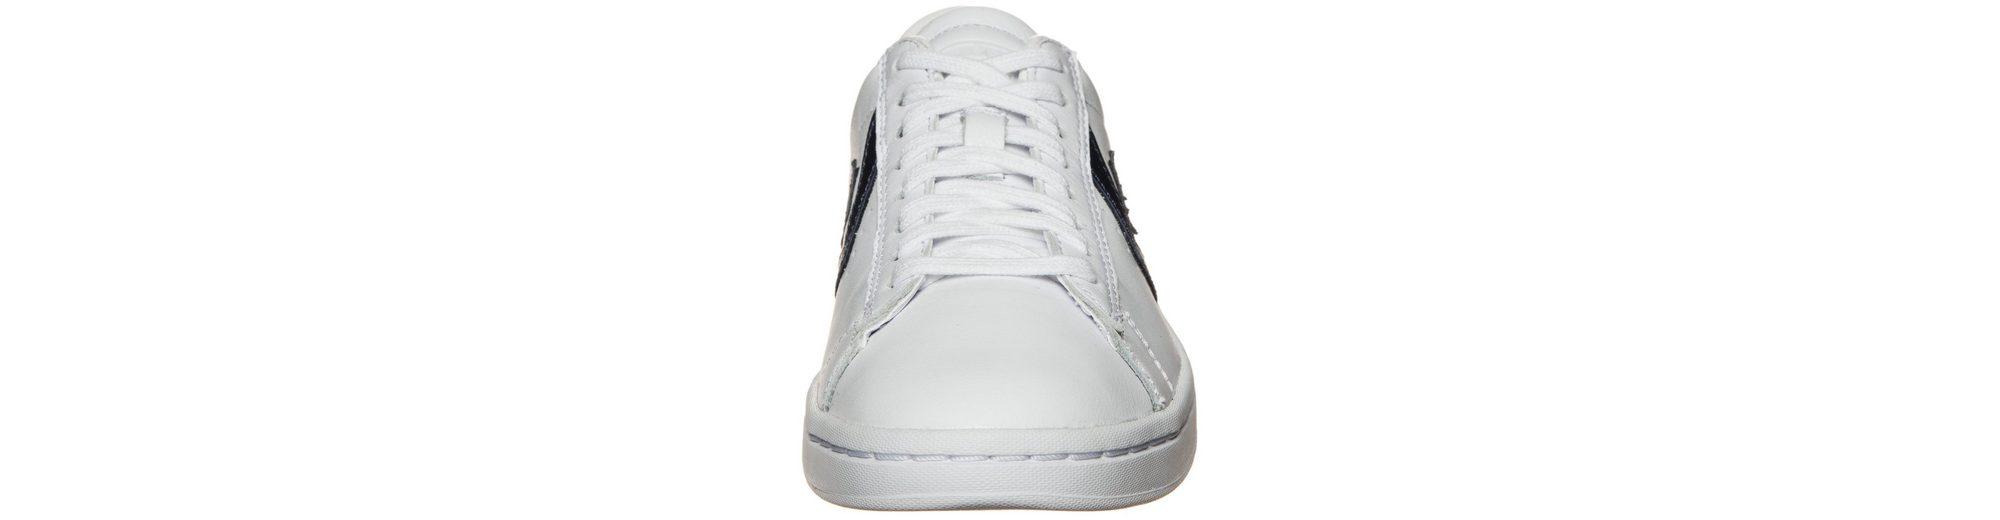 Converse Pro Leather LP OX Sneaker Damen Freies Verschiffen Sammlungen Billig Verkauf Am Besten lYIiI8TTG